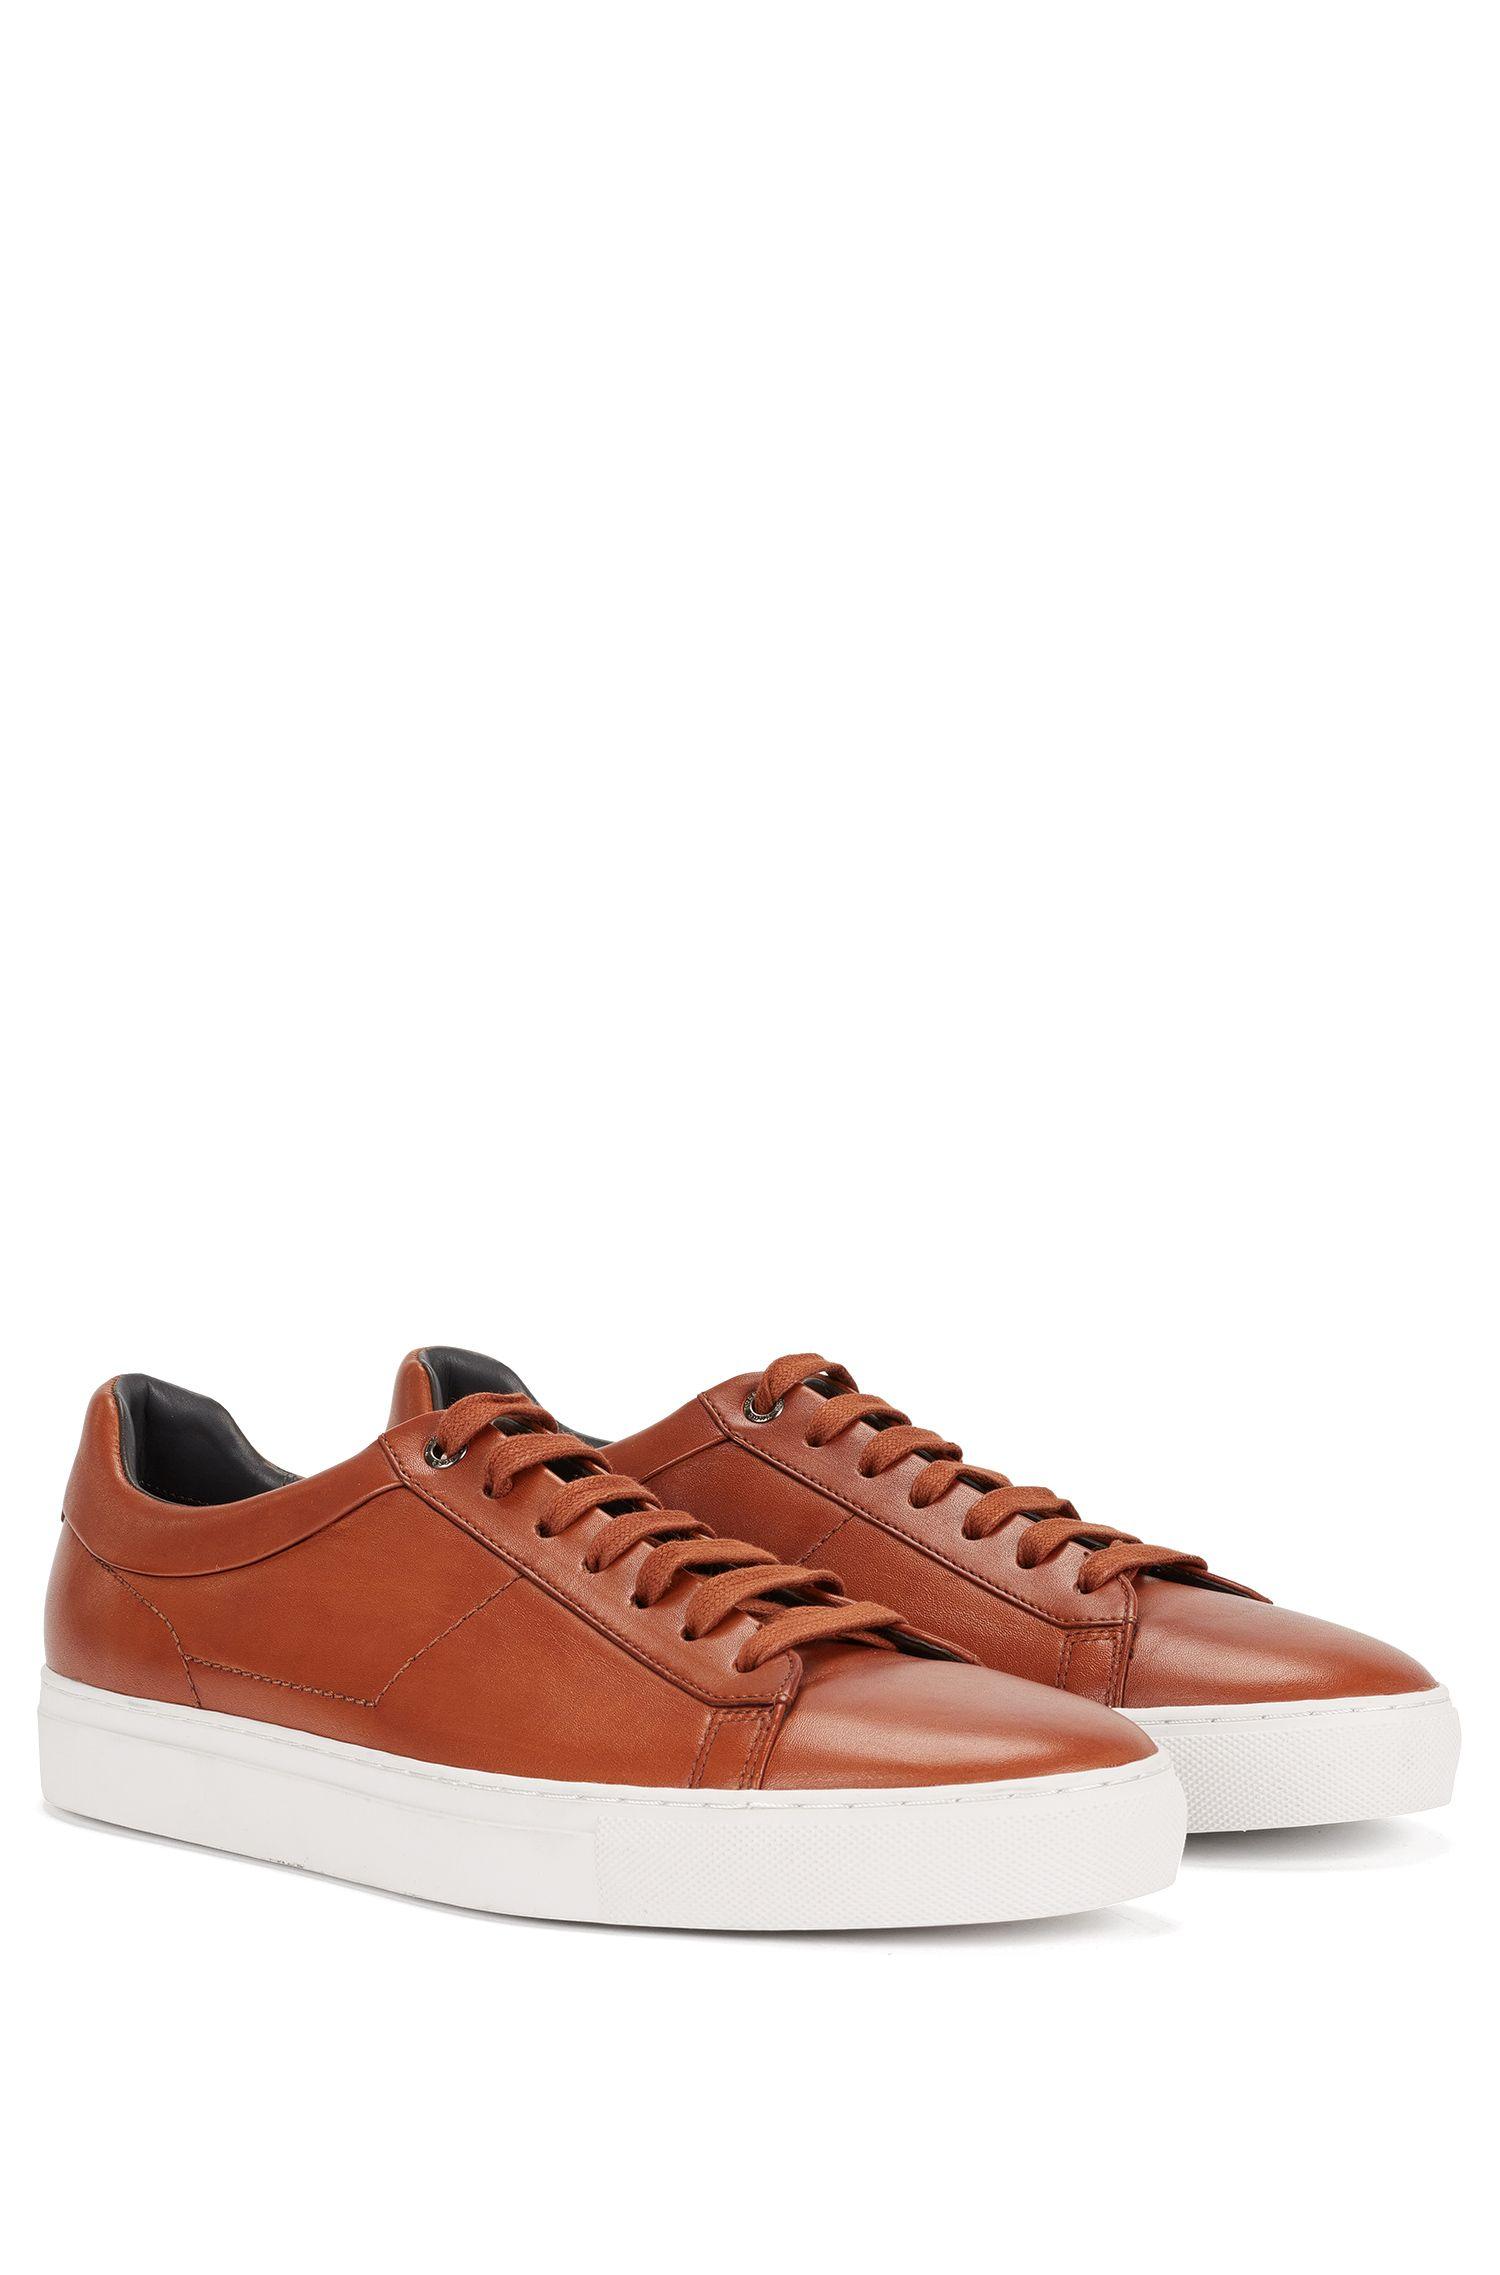 'Timaker' | Italian Calfskin Sneakers